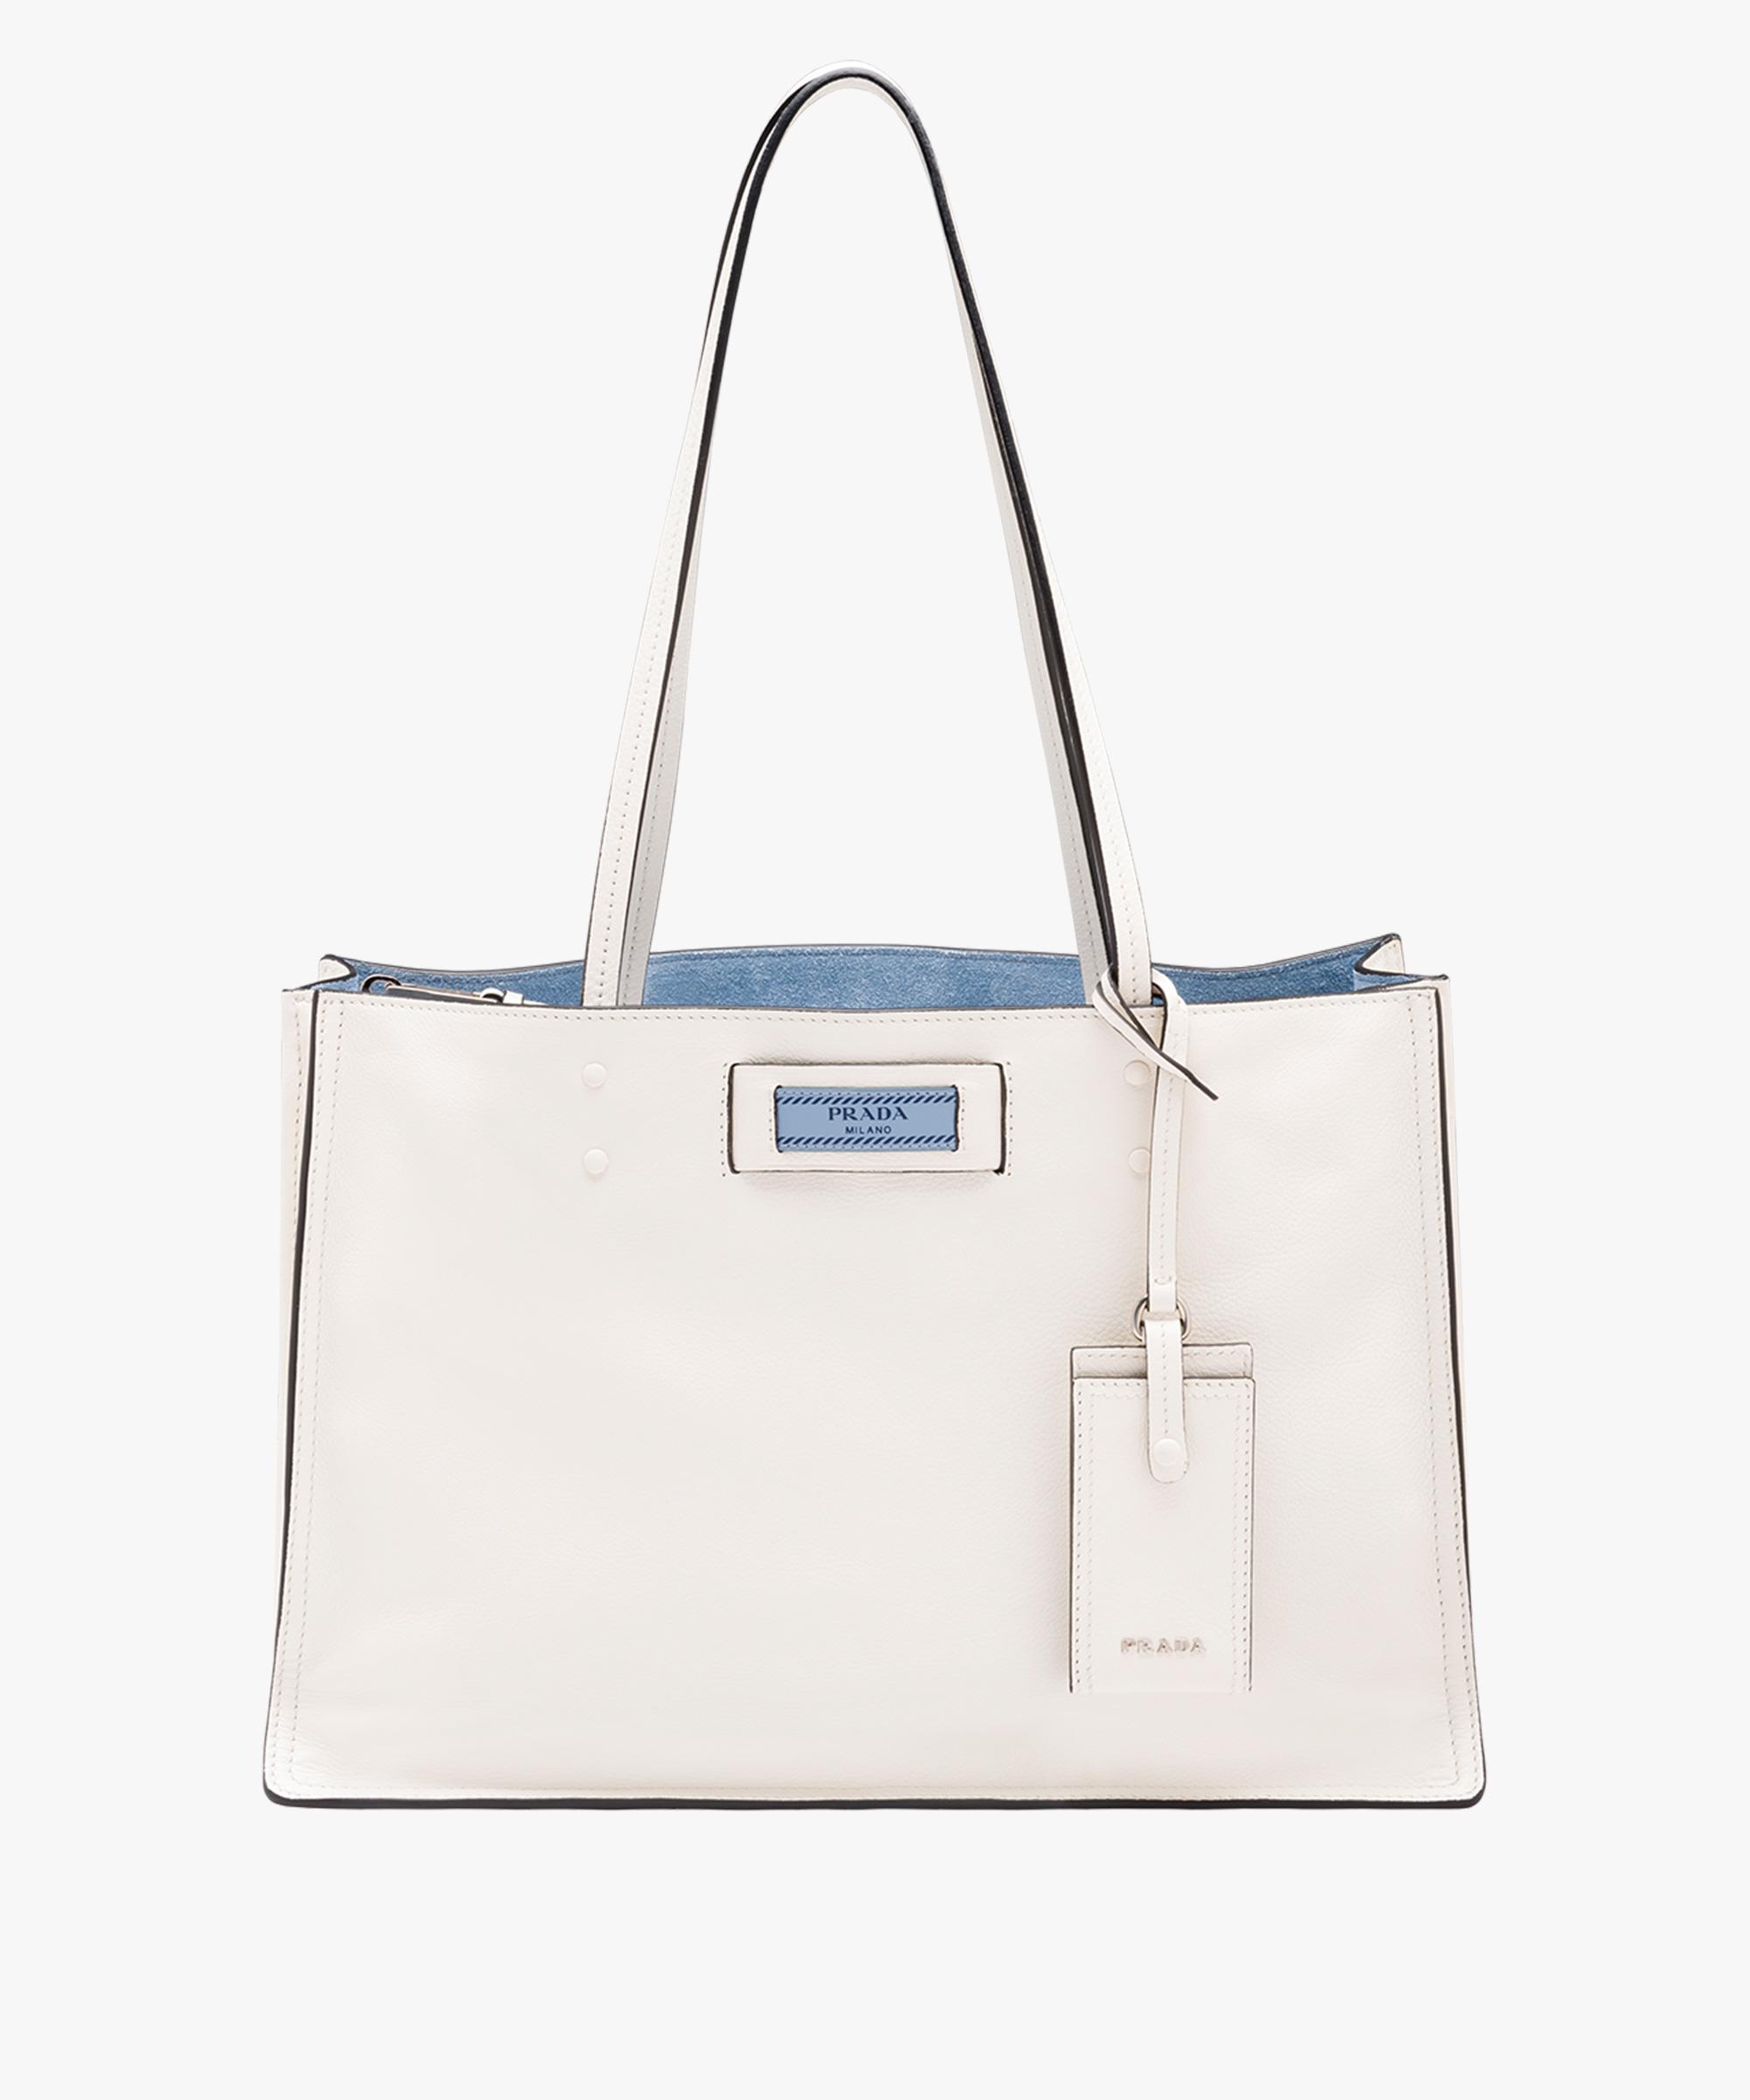 Etiquette shoulder bag - White Prada gjPSBE